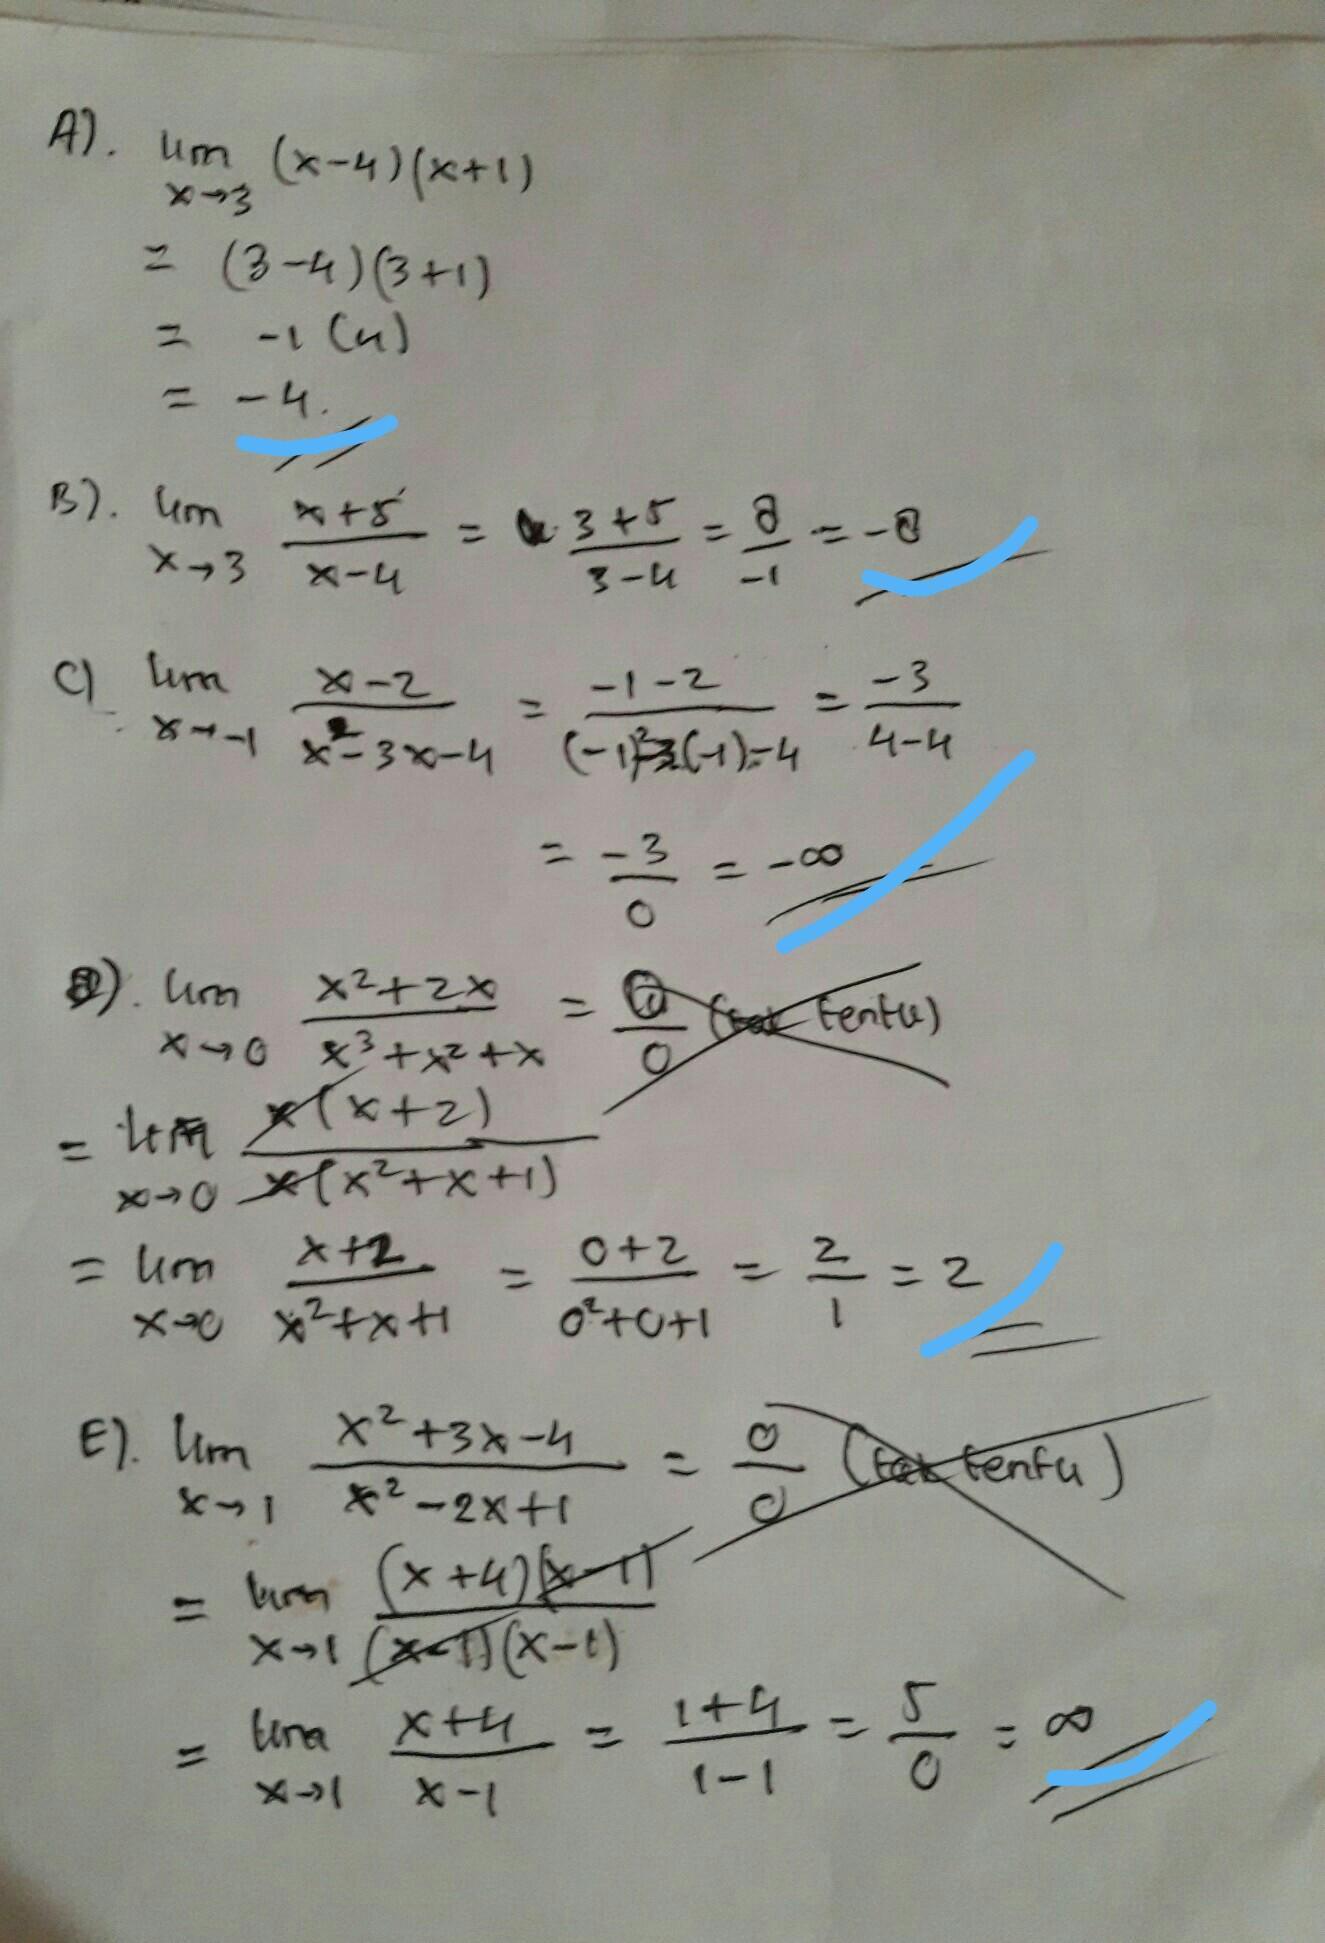 Hitungan Nilai Limit Fungsi Berikut A Lim X 4 X 1 X Gt 3 B Lim X 5 X Gt 3 X 4 C Lim X 2 Brainly Co Id